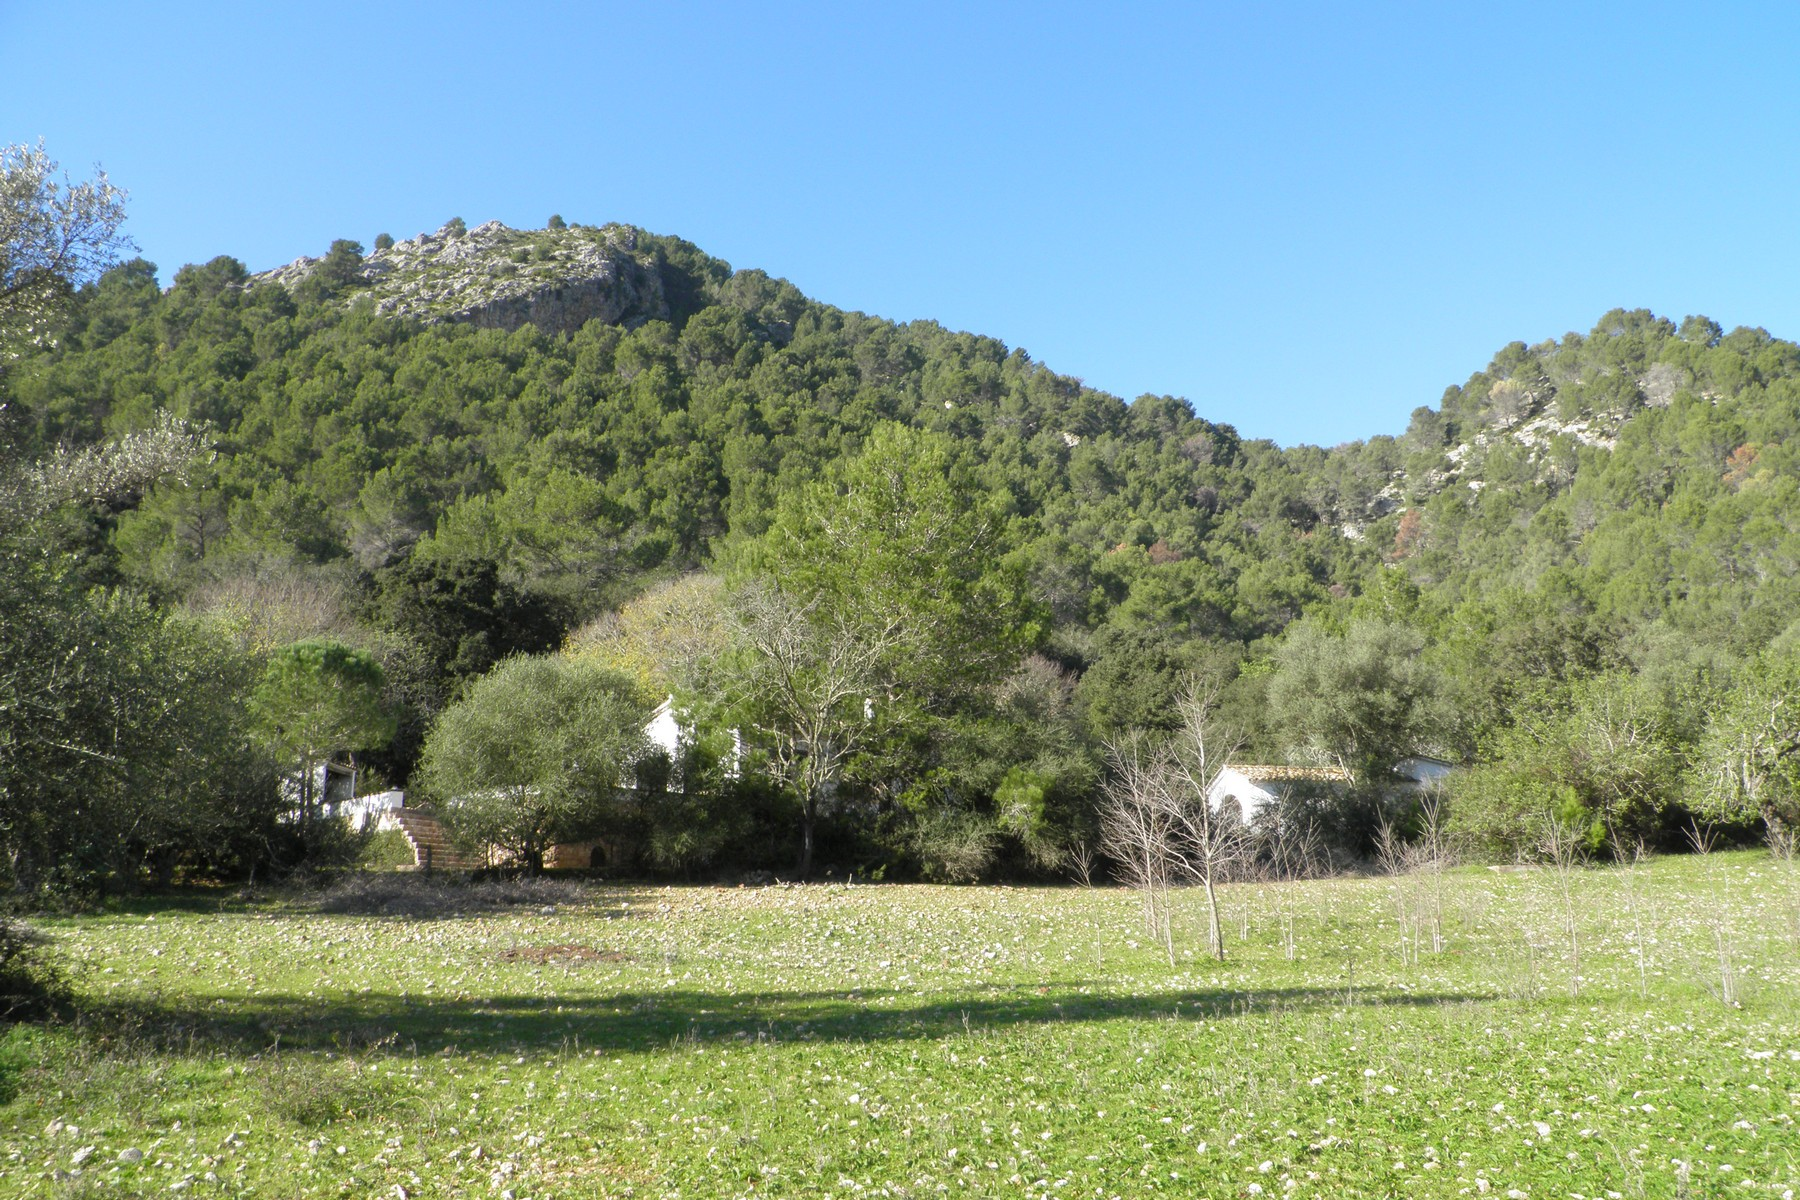 Maison unifamiliale pour l Vente à Historic Estate in Pollensa Pollensa, Majorque, 07460 Espagne